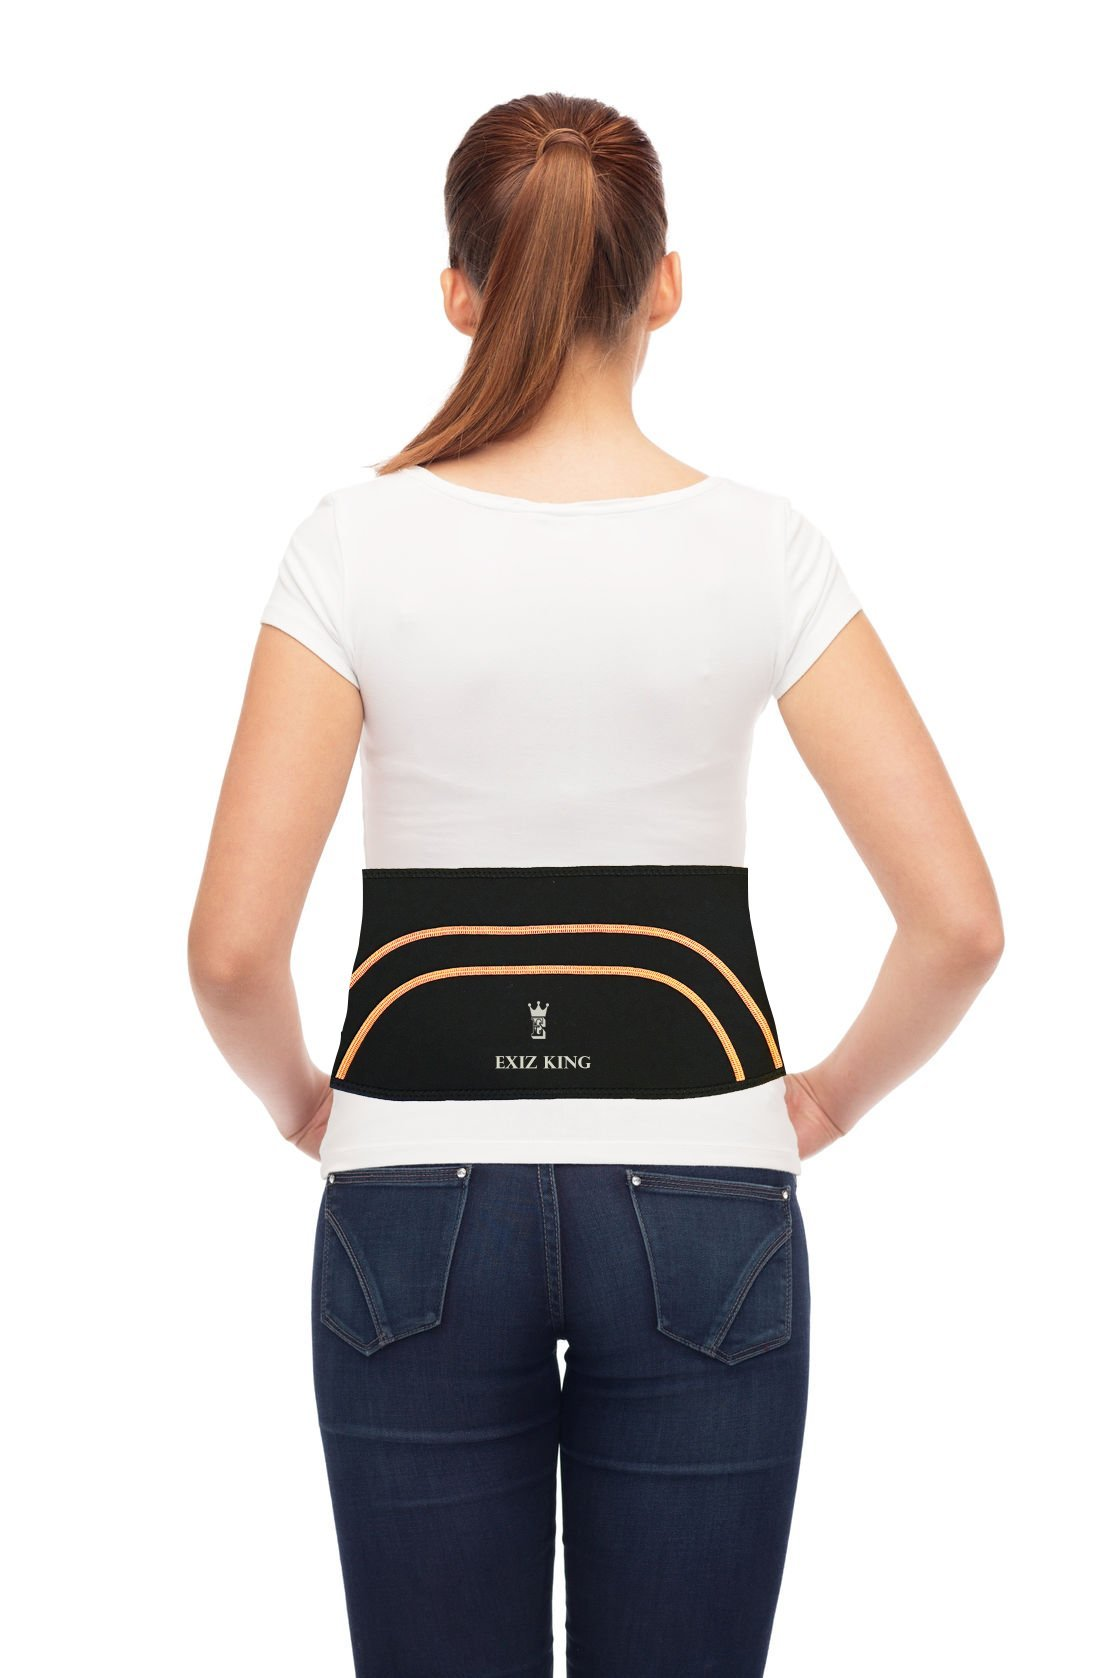 Exiz King Copper Back Fit Pro Waist Belt Provides Lower Back Support Compression Infuse Brace Belt Lumber Wrap - Back Pain Relief (L/XL(39''-50''))